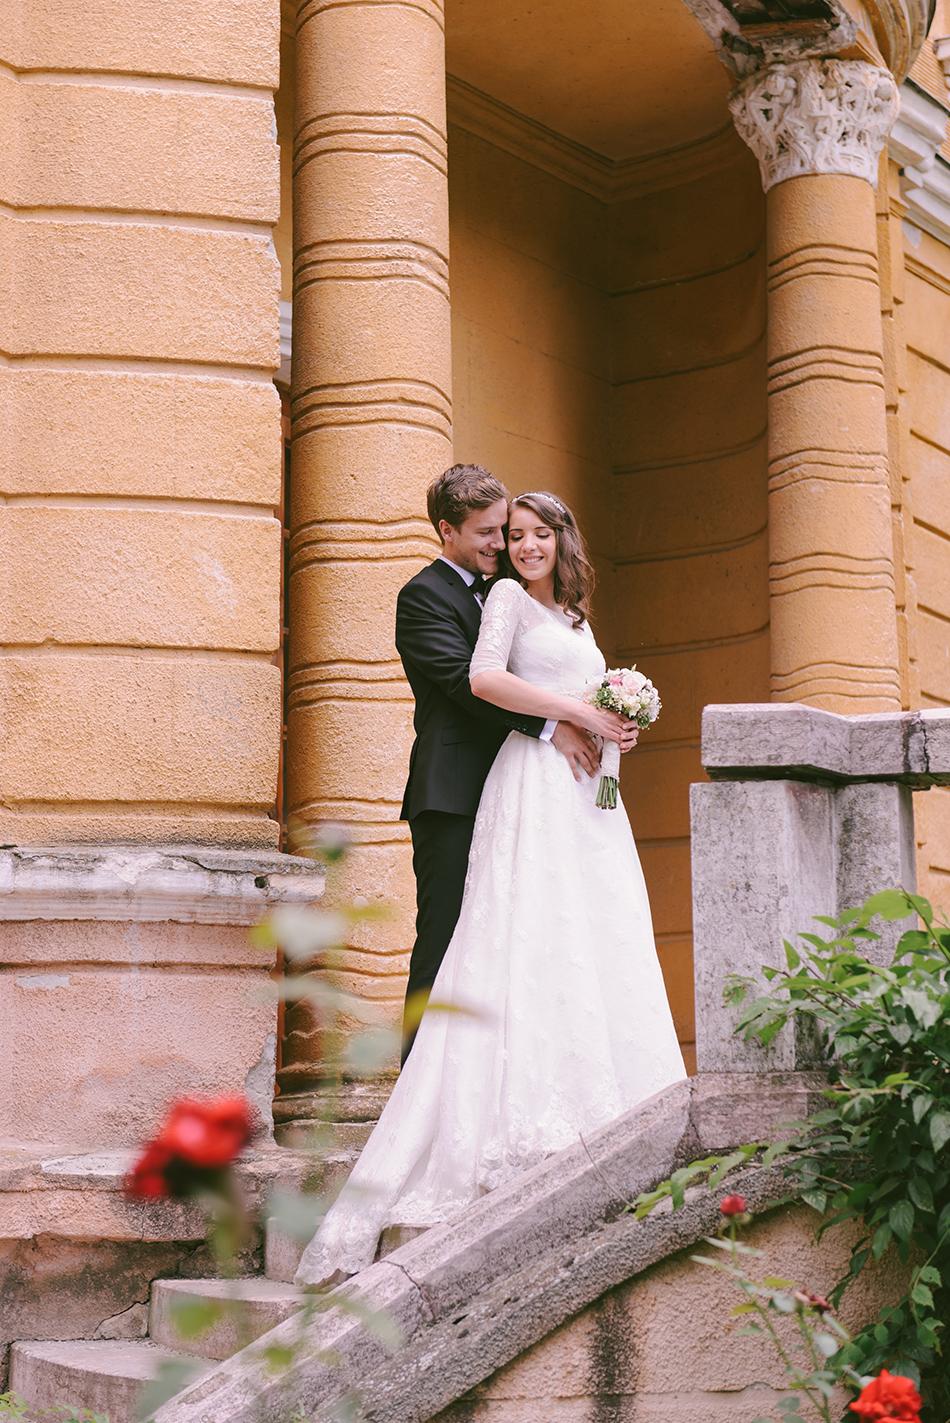 AD Passion Photography | sami-ela-lela-nunta-domeniu-lupas-arad_0058 | Adelin, Dida, fotograf profesionist, fotograf de nunta, fotografie de nunta, fotograf Timisoara, fotograf Craiova, fotograf Bucuresti, fotograf Arad, nunta Timisoara, nunta Arad, nunta Bucuresti, nunta Craiova